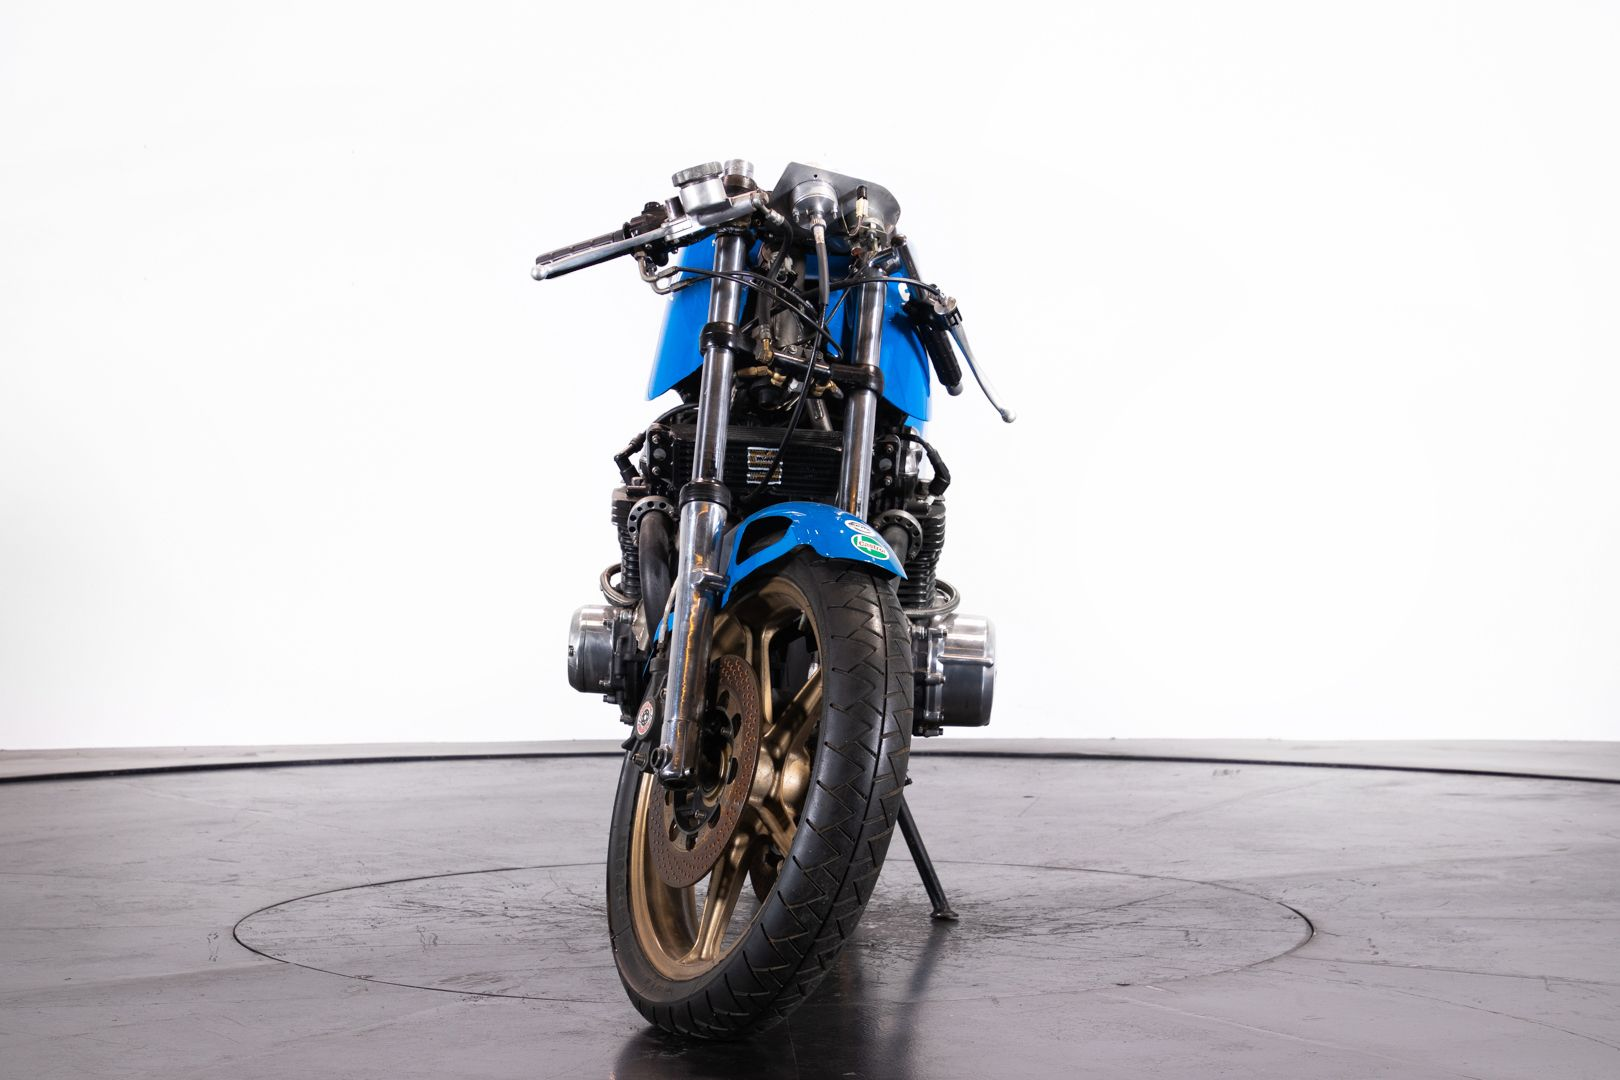 1980 Kawasaki Segoni 900 Testa Nera 74916